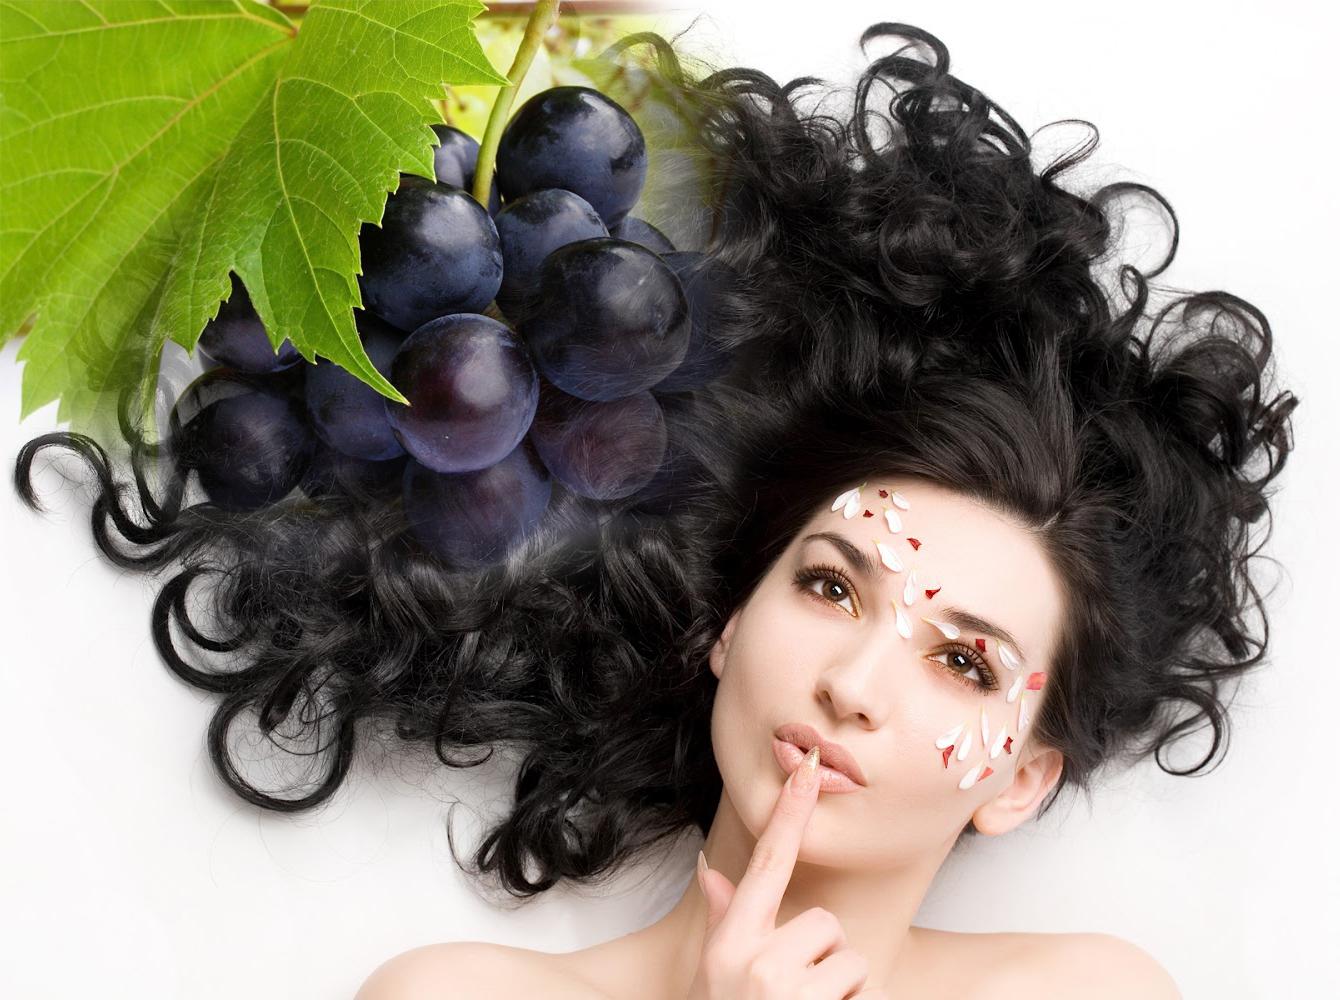 thực phẩm bổ sung collagen 8